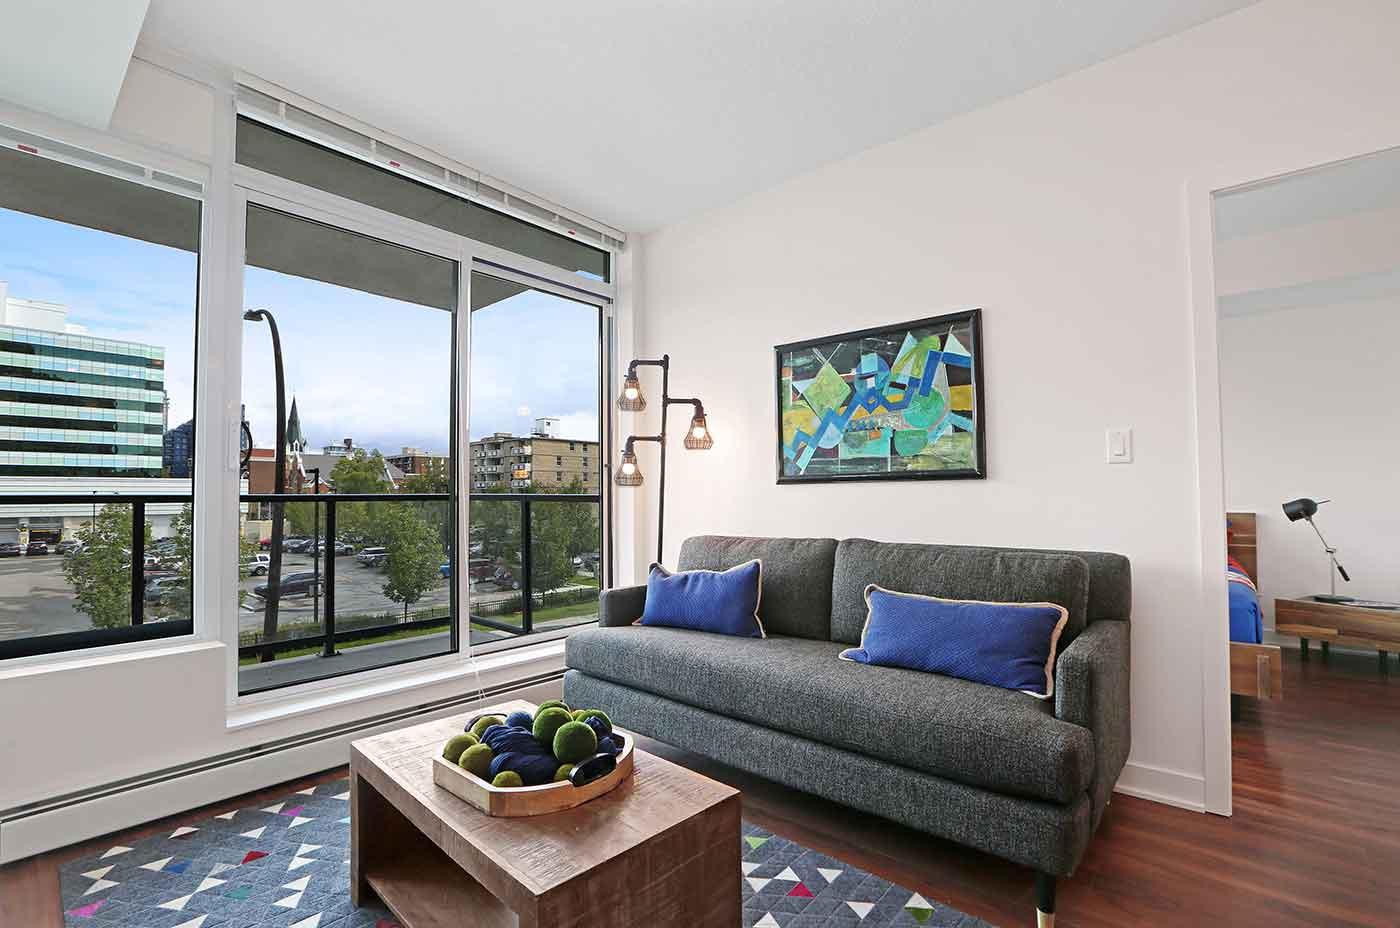 1215 Rental Apartments - One bedroom F2 Livingroom Balcony view